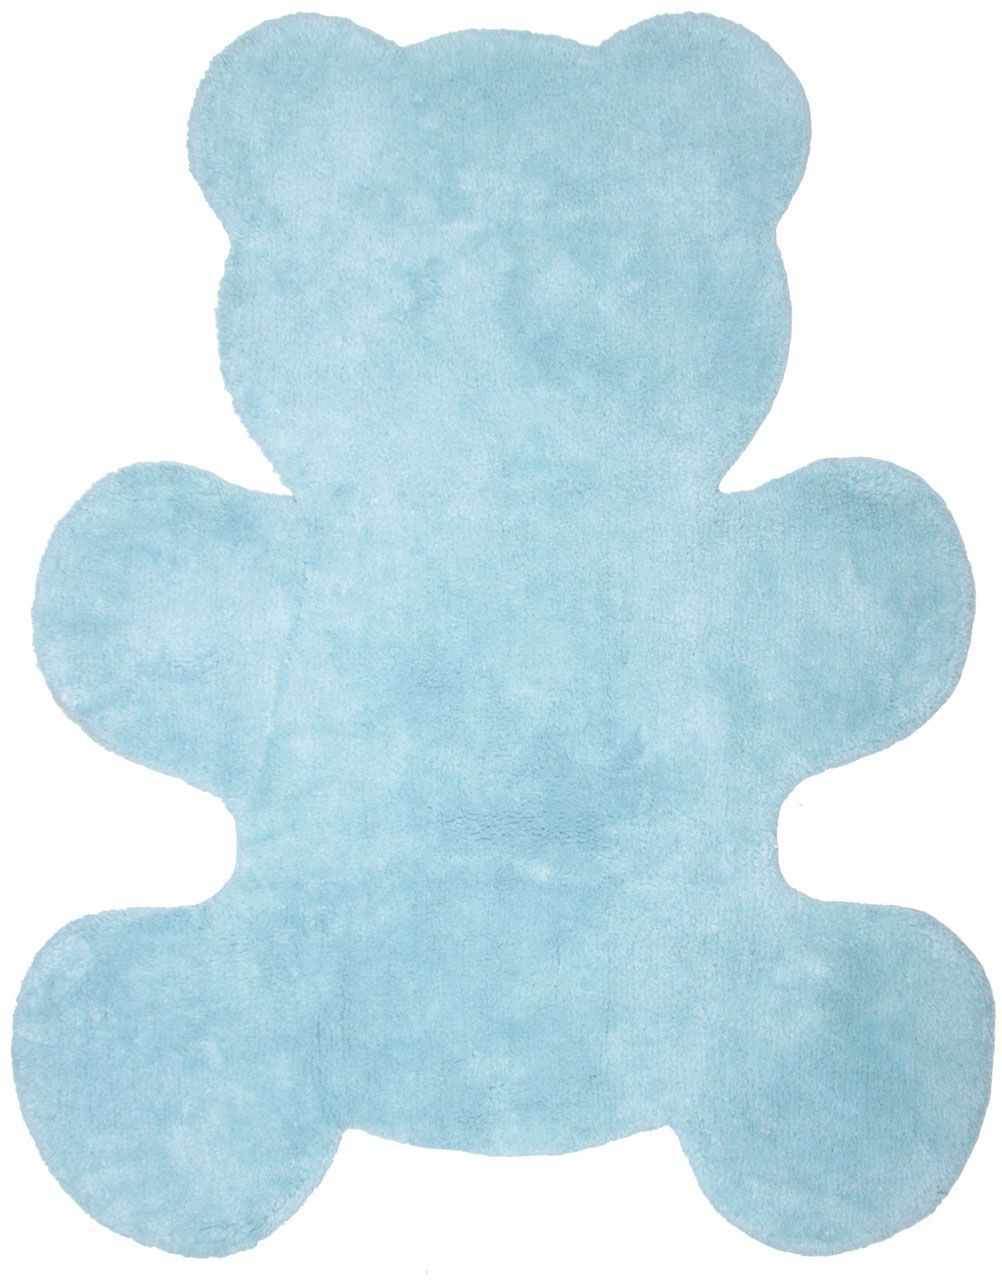 tapis little teddy forme ourson bleu ciel coton nattiot. Black Bedroom Furniture Sets. Home Design Ideas